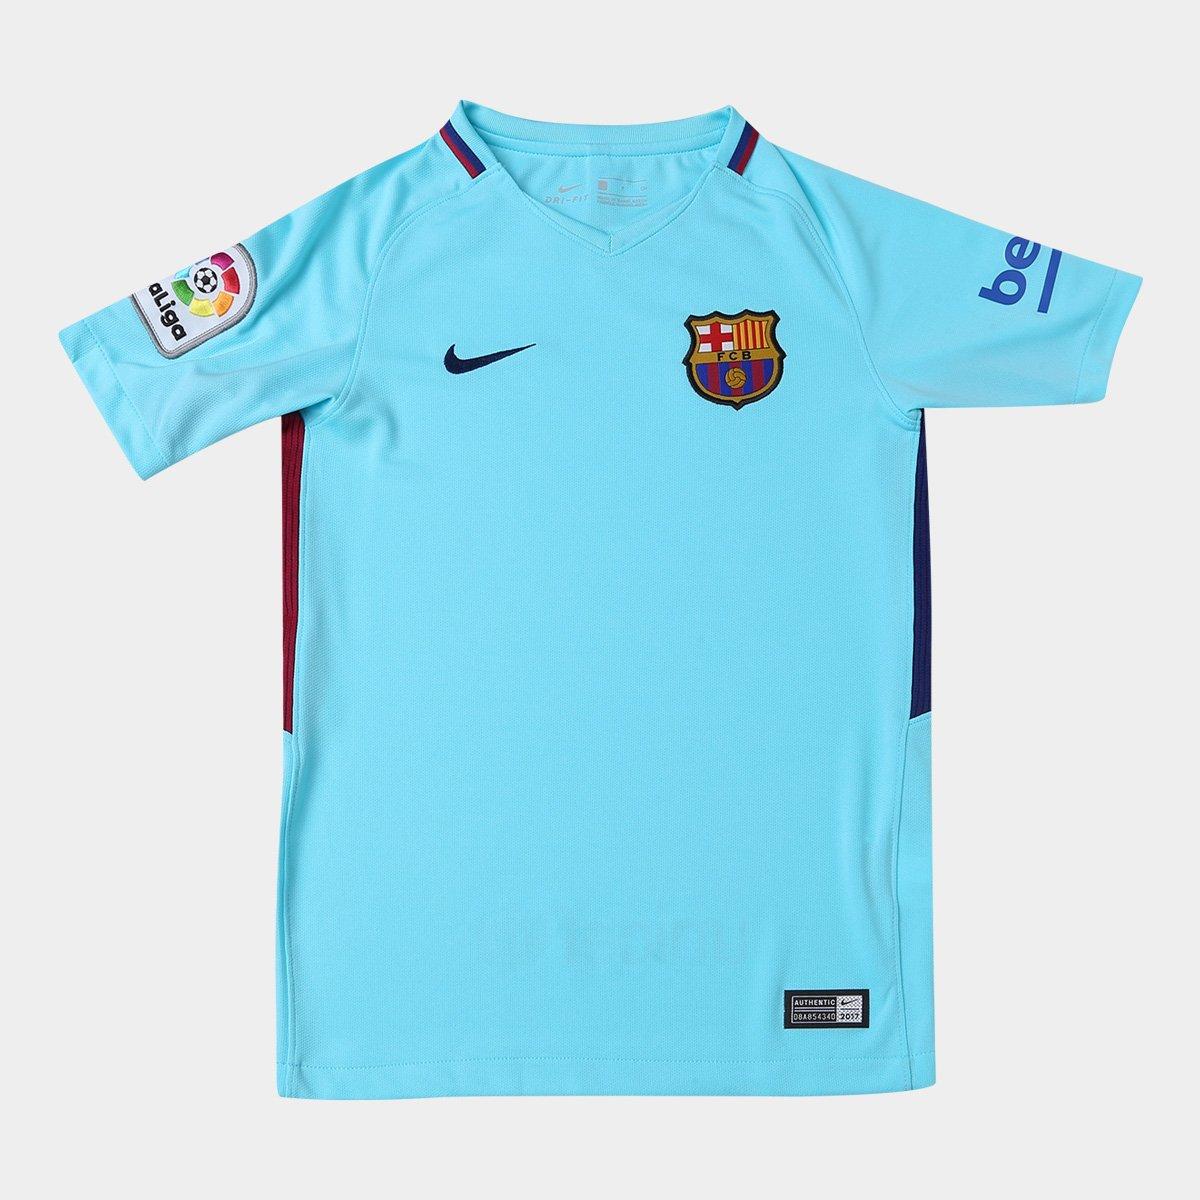 Camisa Barcelona Juvenil Away 17 18 s n° - Torcedor Nike - Compre ... ed064c3b1b595